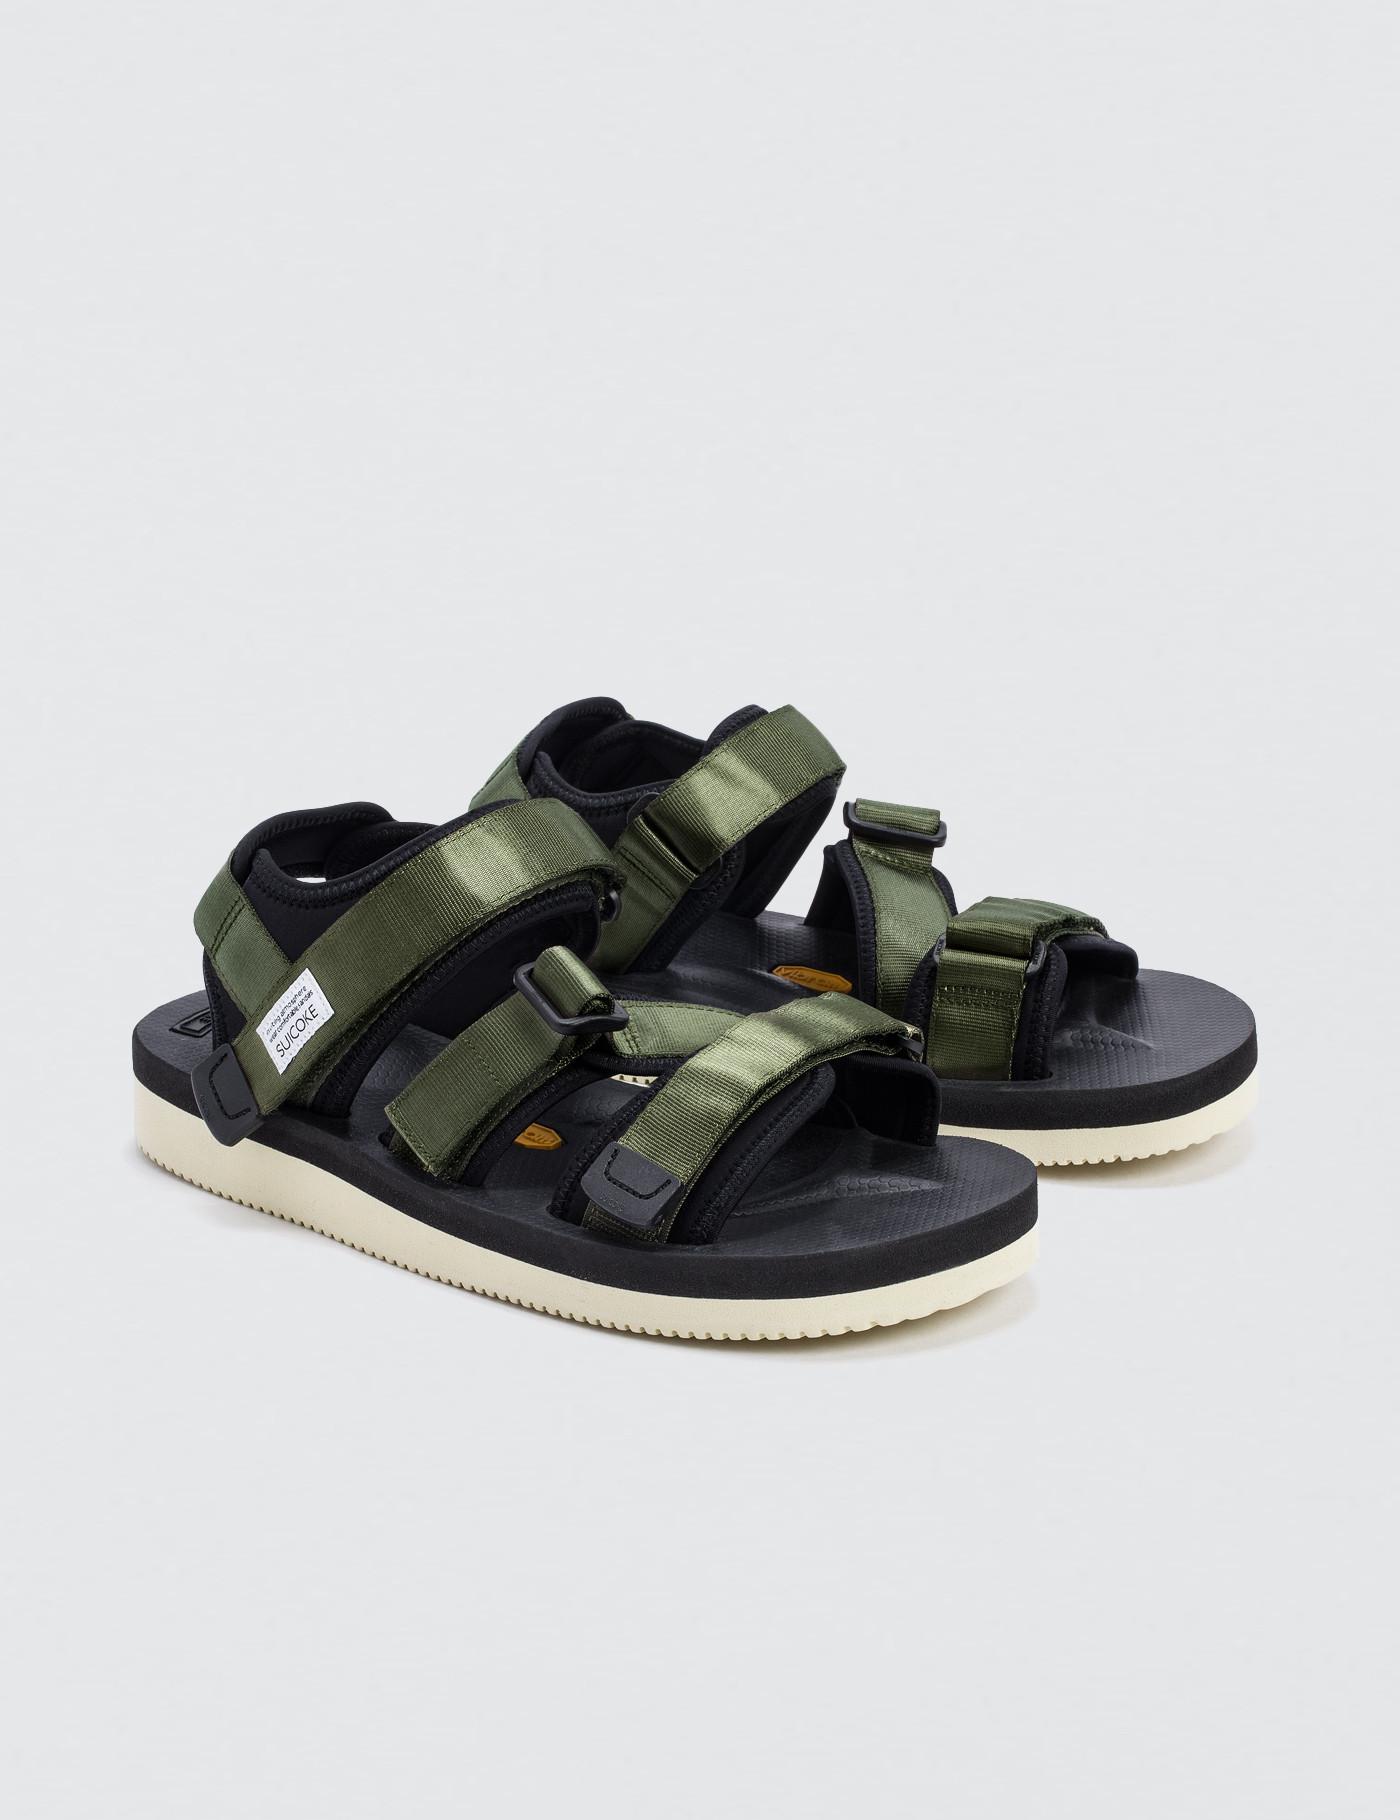 f75db22f3c5f Suicoke Kisee-v Sandals in Green for Men - Save 0.8733624454148412 ...